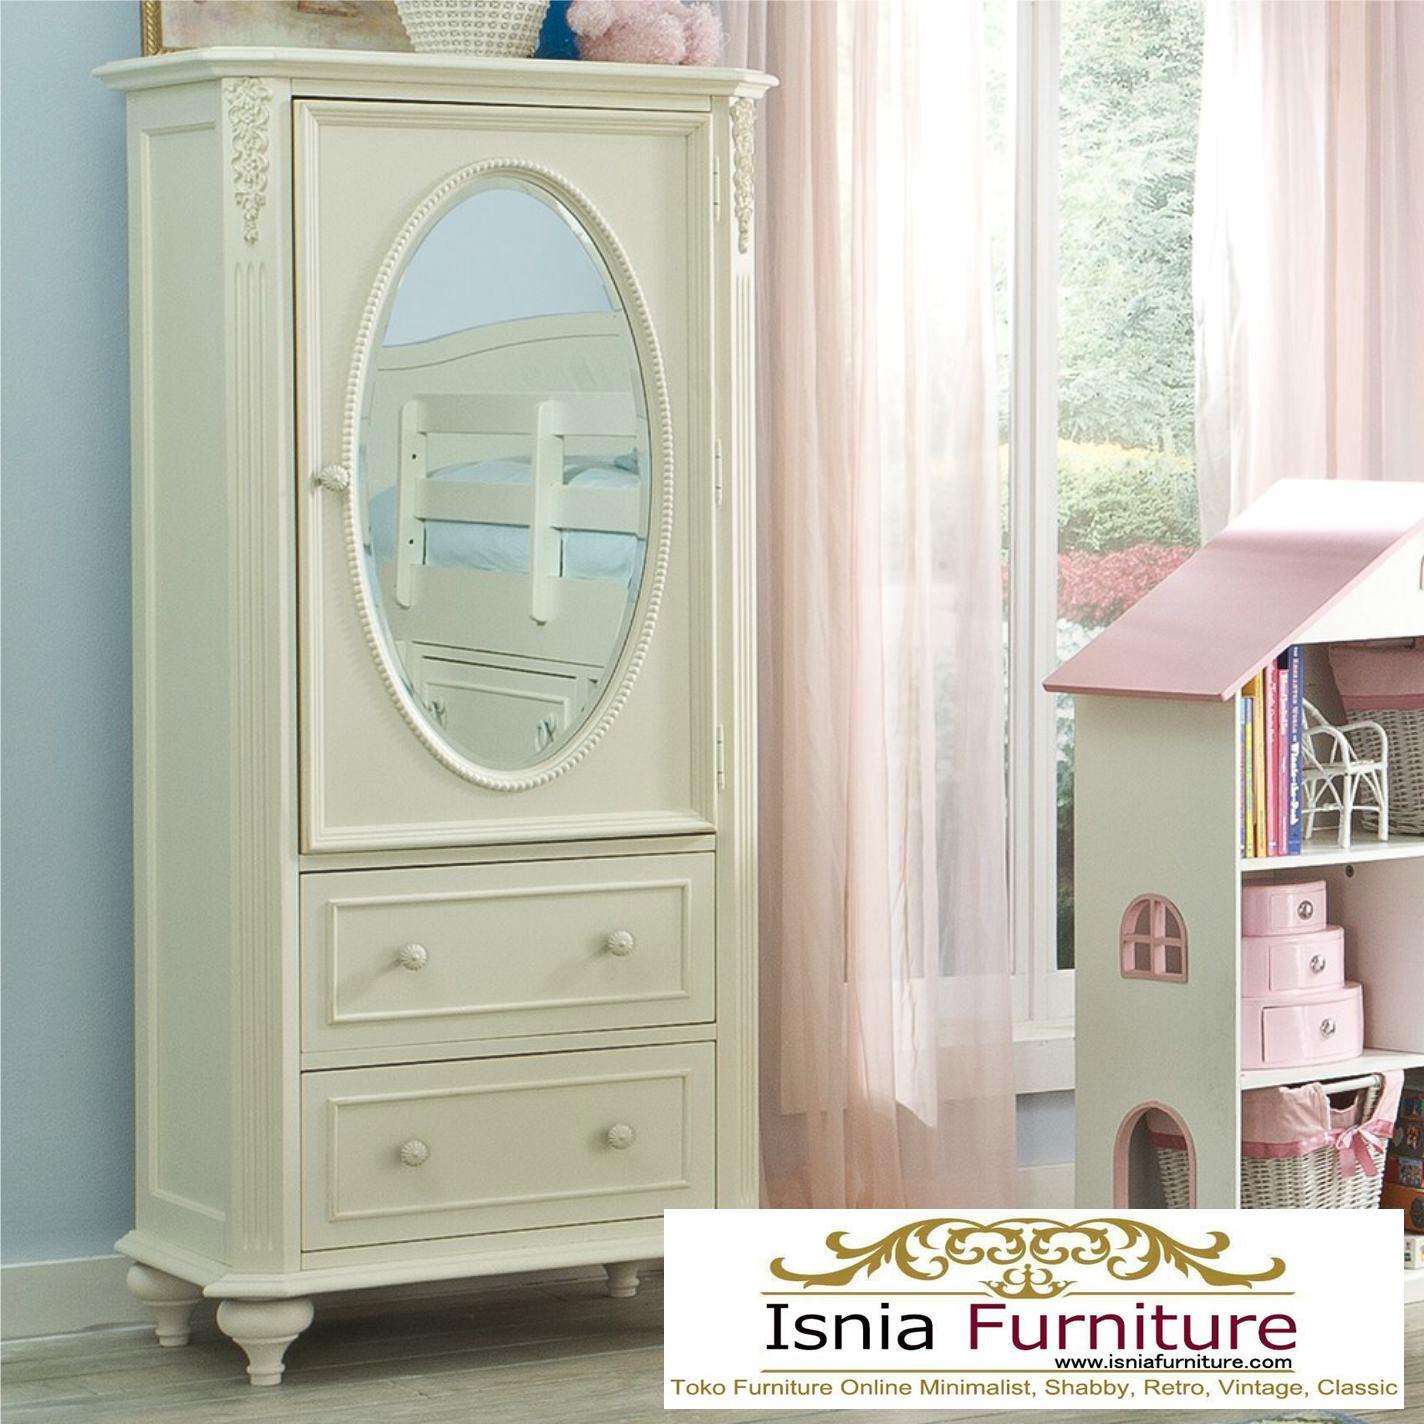 Lemari-Baju-Anak-Minimalis-1-Pintu-Dengan-Kaca-Cermin Lemari Baju Anak Minimalis 1 Pintu Dengan Kaca Cermin